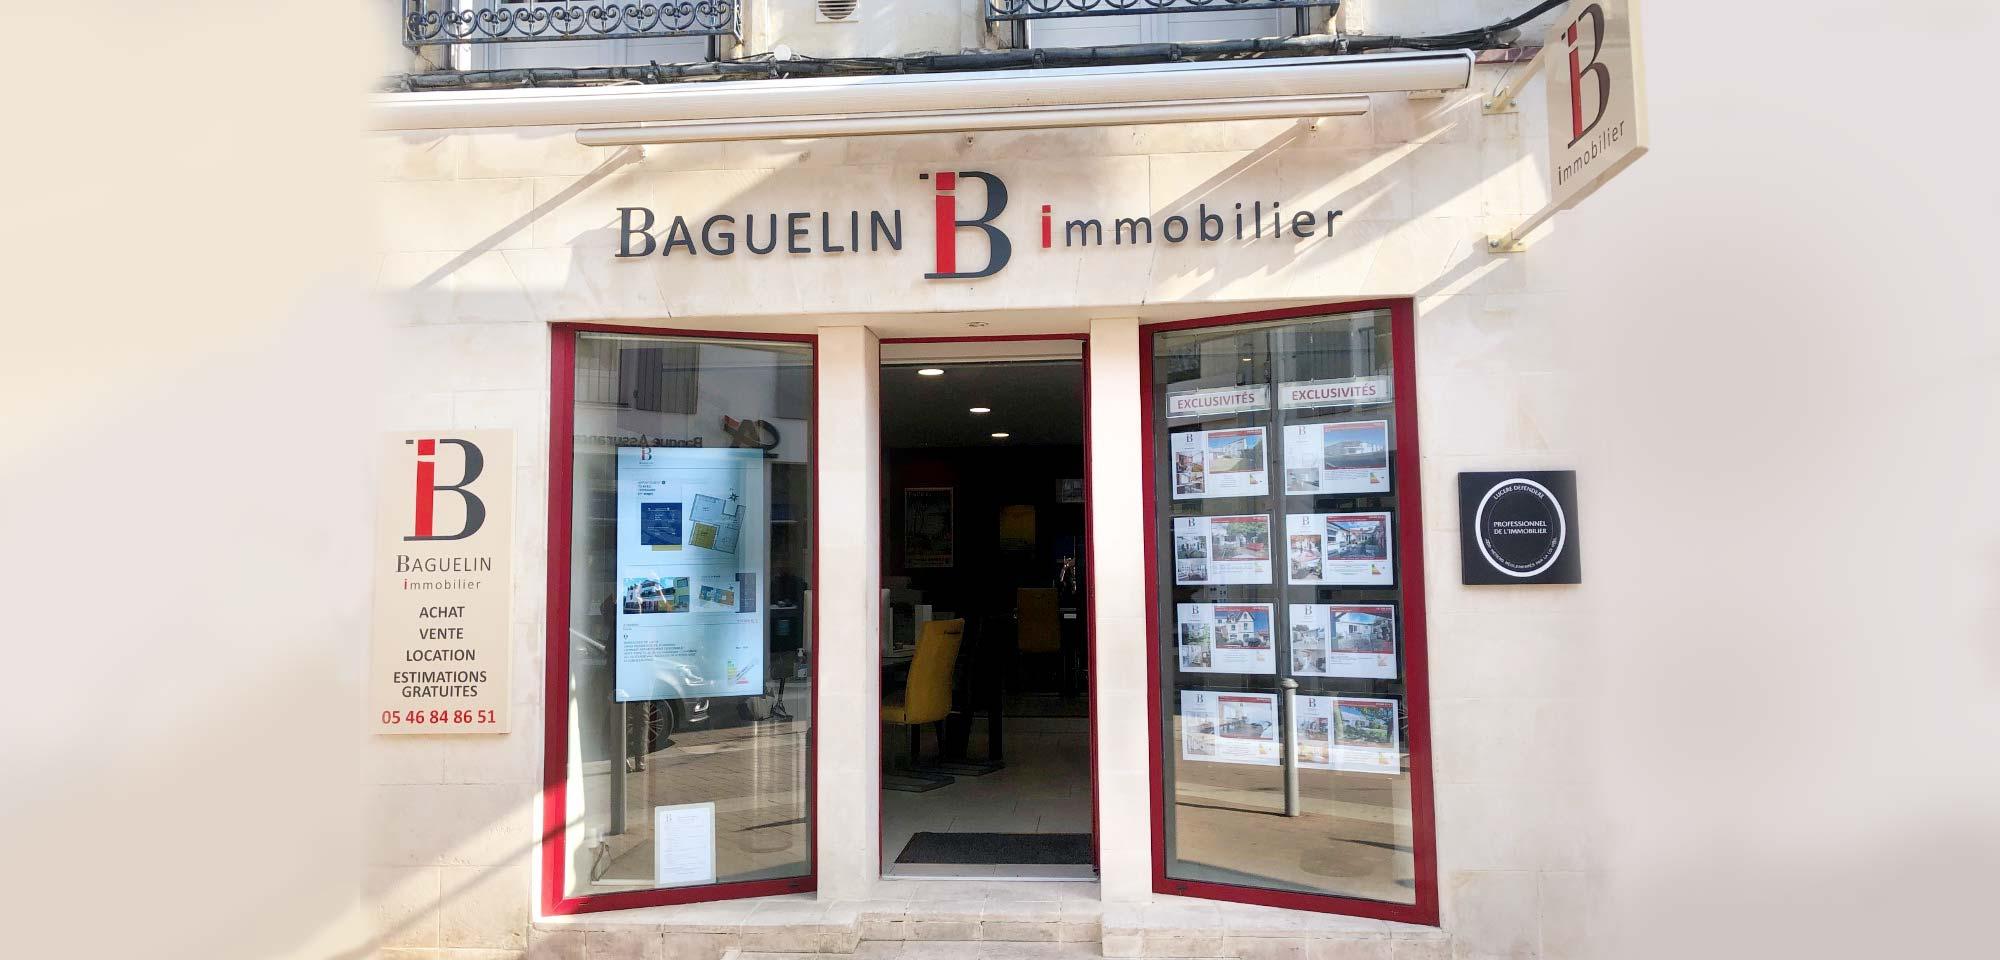 Baguelin Immobilier